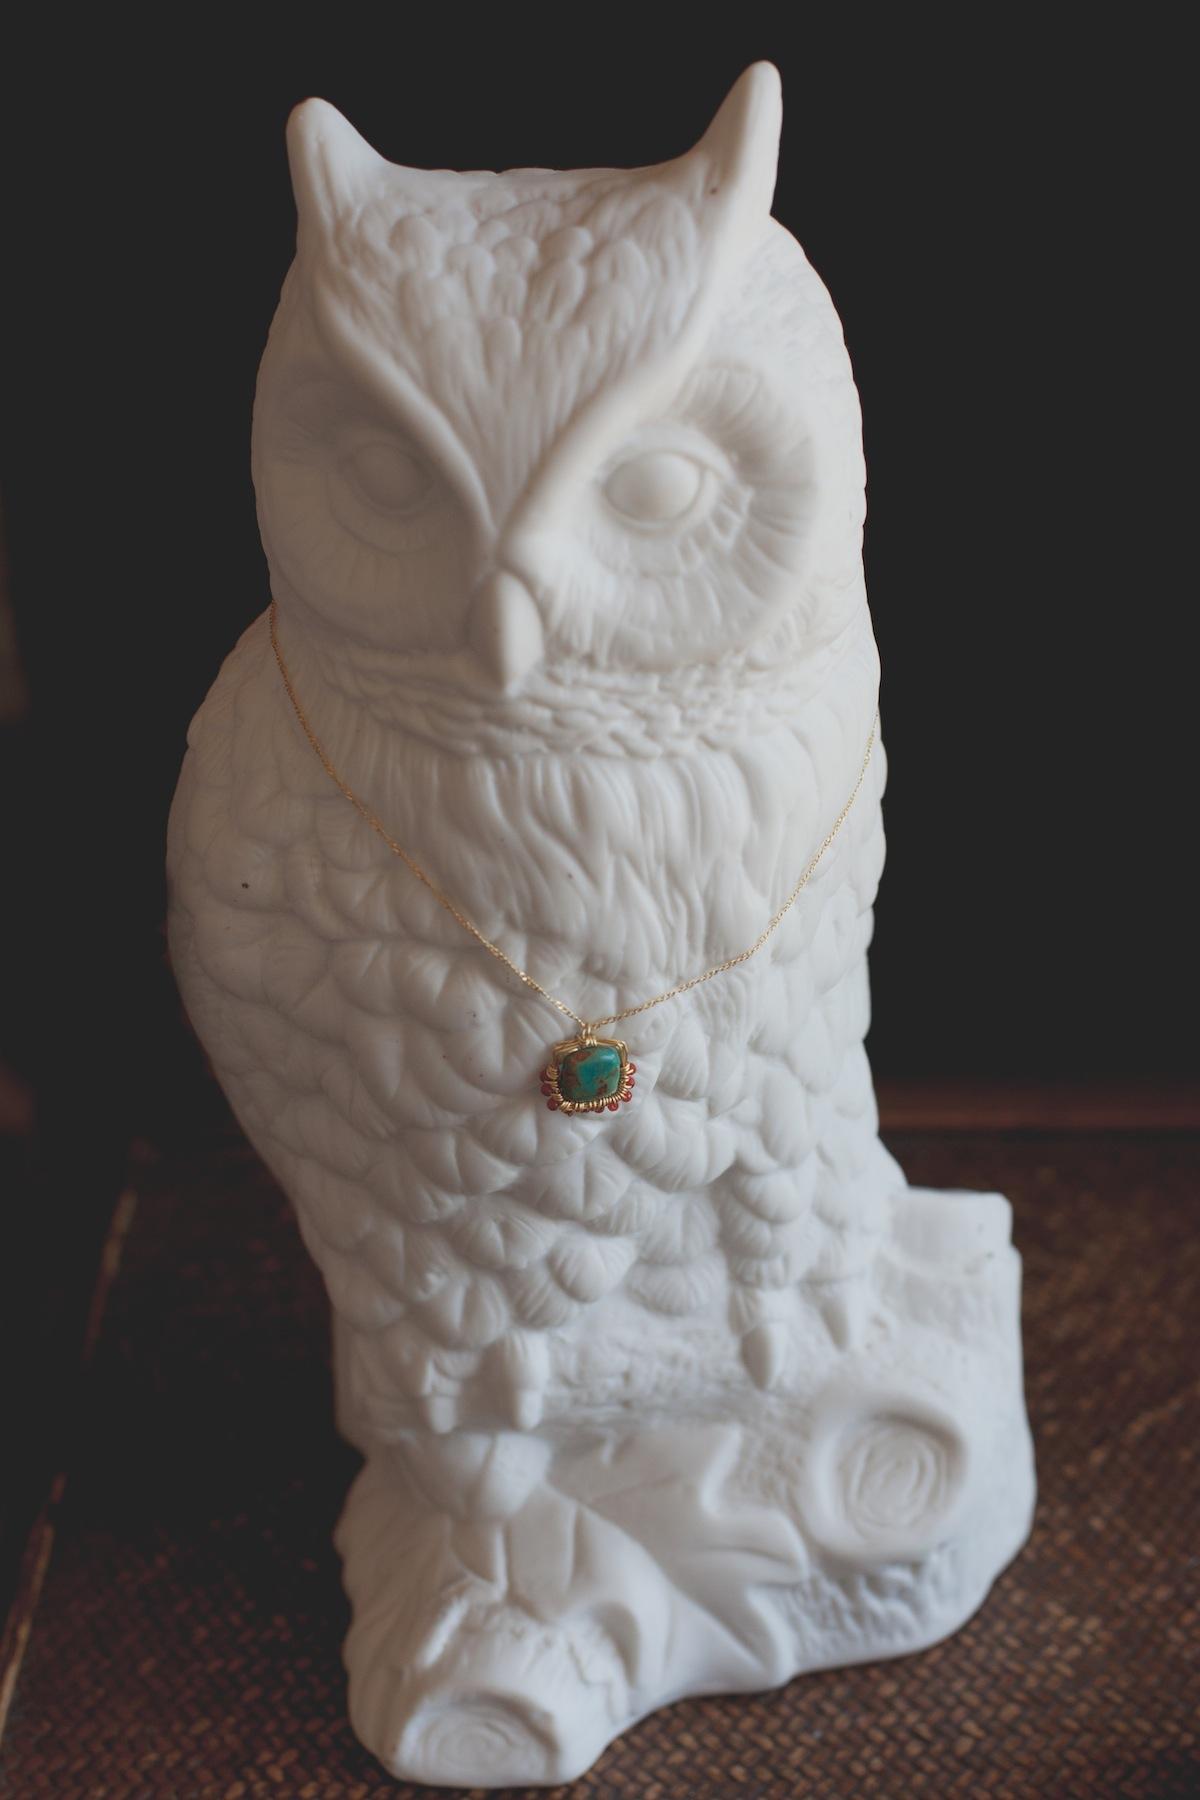 Votive-Image-Jewelry-Details-4.jpg